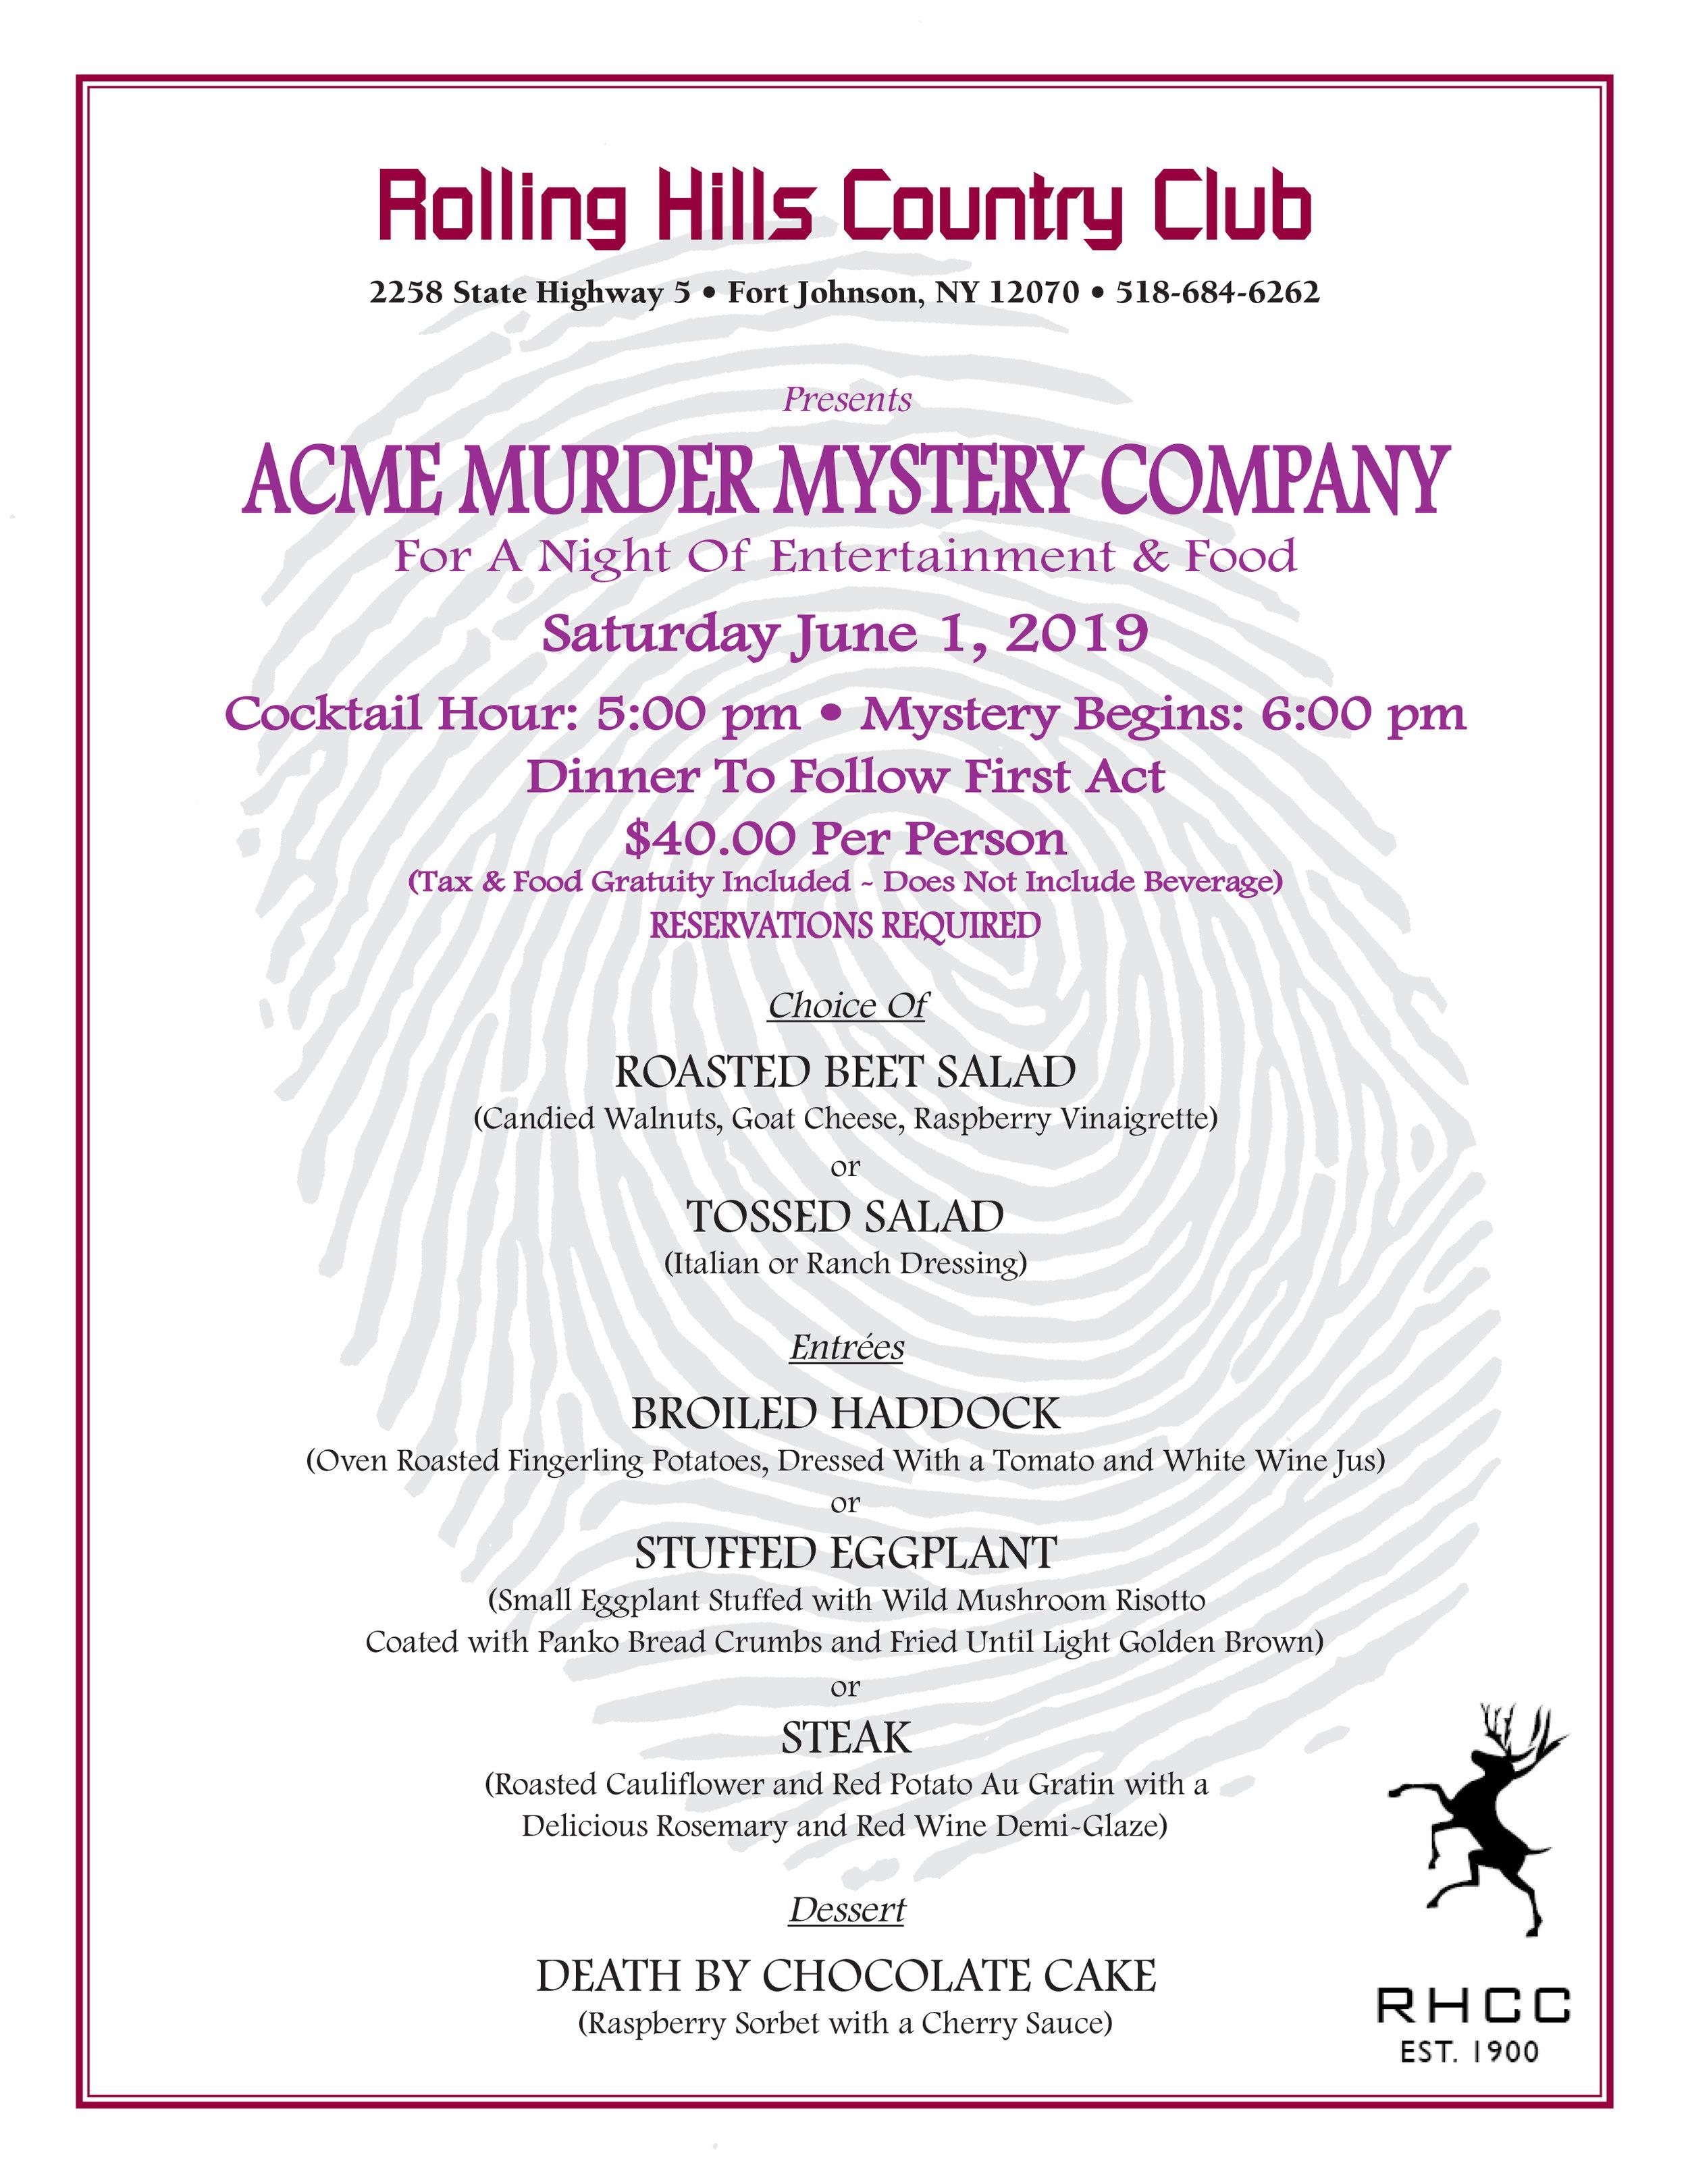 Rolling Hills Acme Murder Mystery 2019.jpg